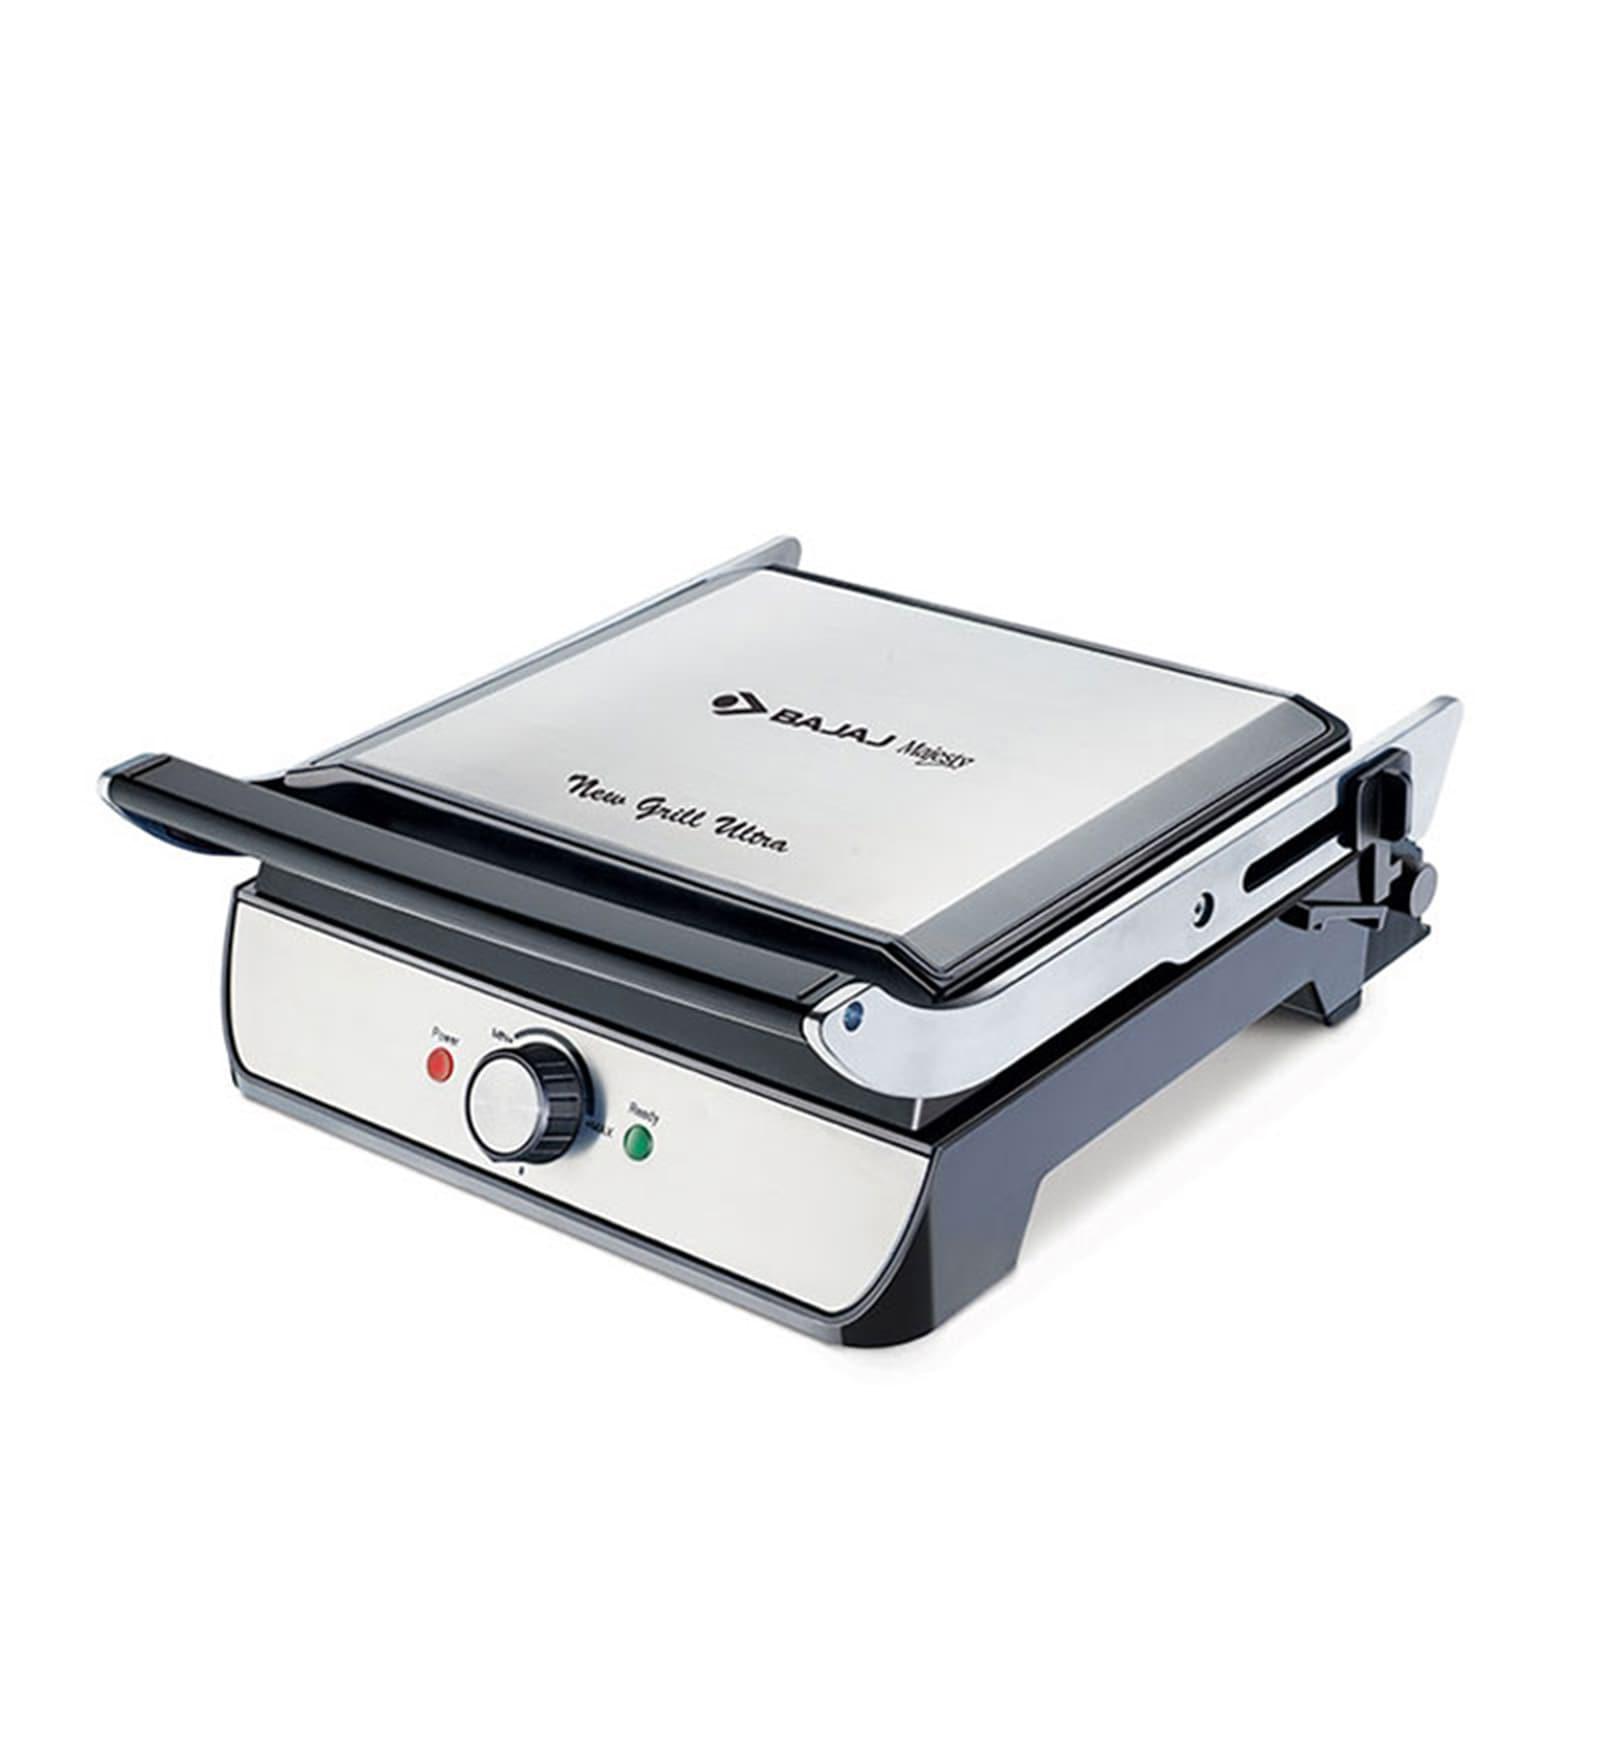 Bajaj Majesty New Grill Ultra 2000W Sandwich Maker